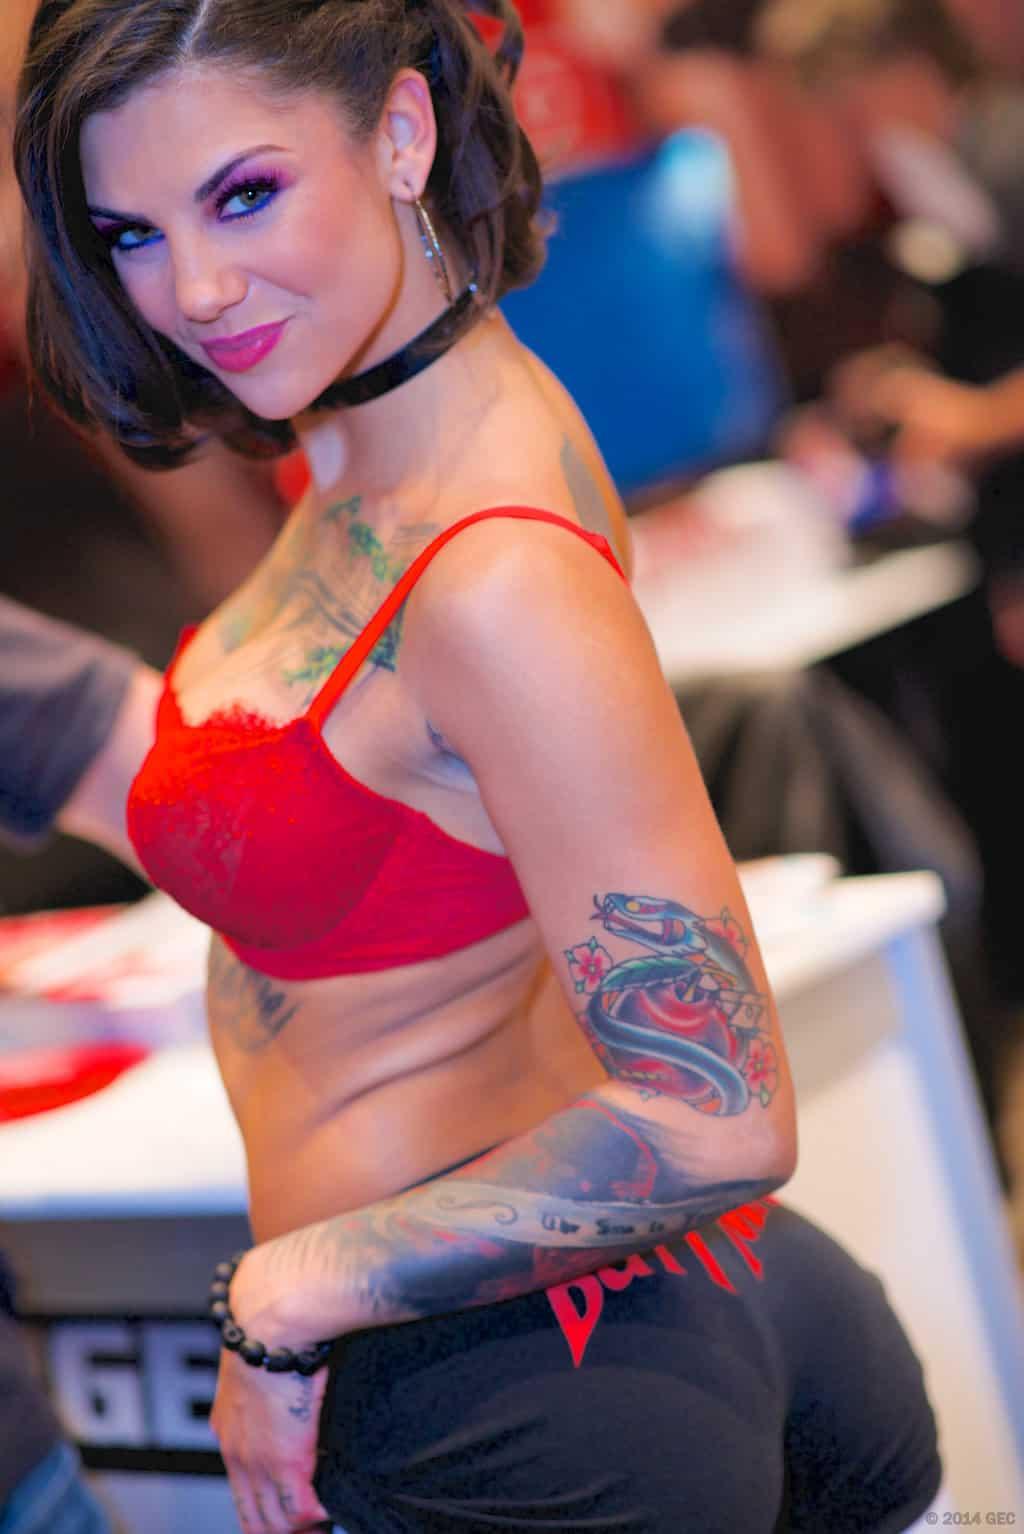 Bonnie_Rotten_AVN_Expo_2014